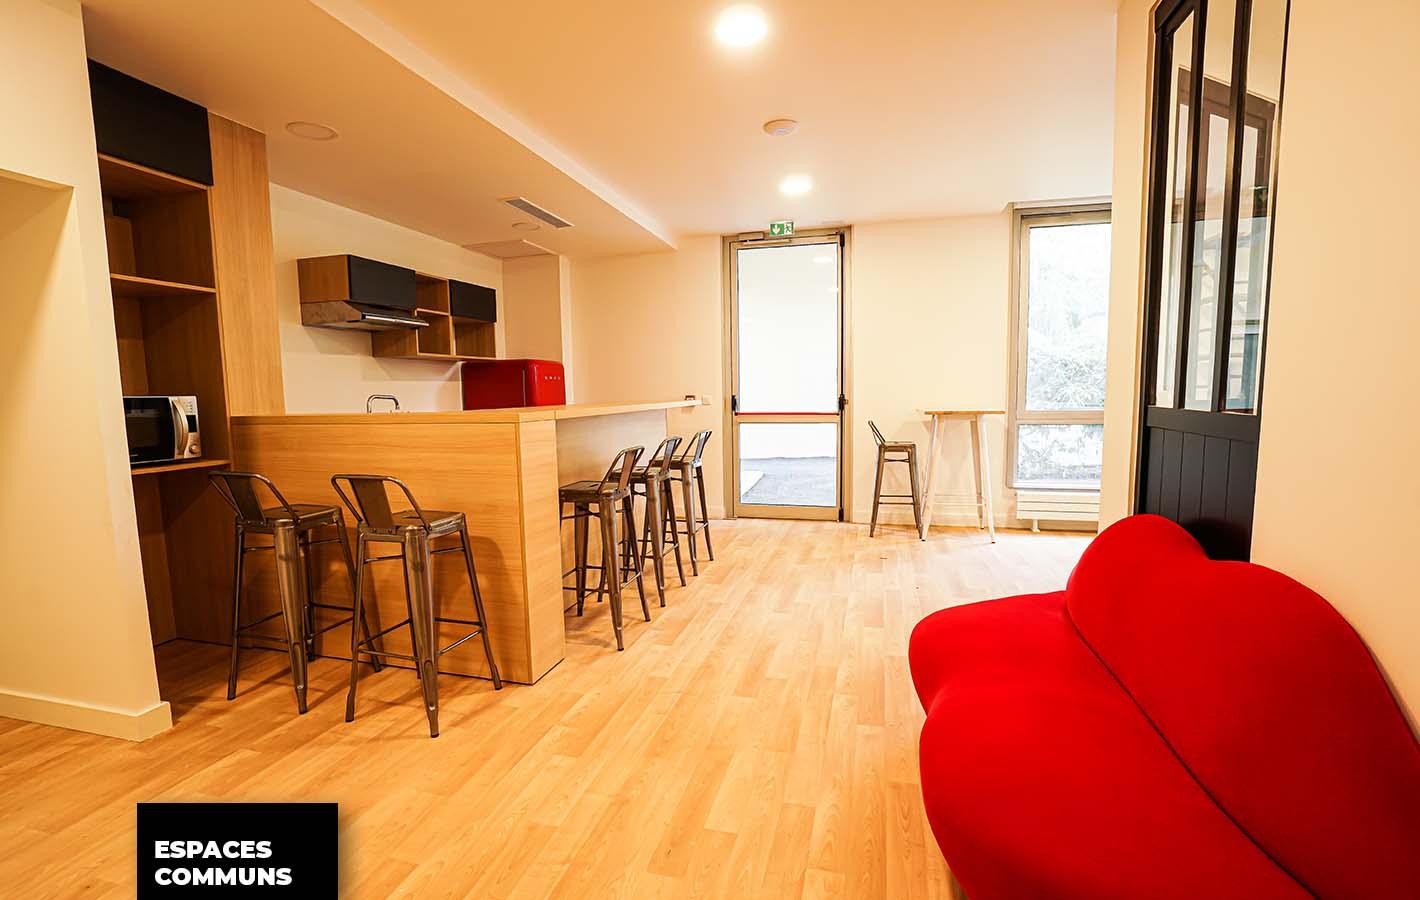 image  2021 09 02 residence etudiante suitetudes la galerie communs cuisine 1